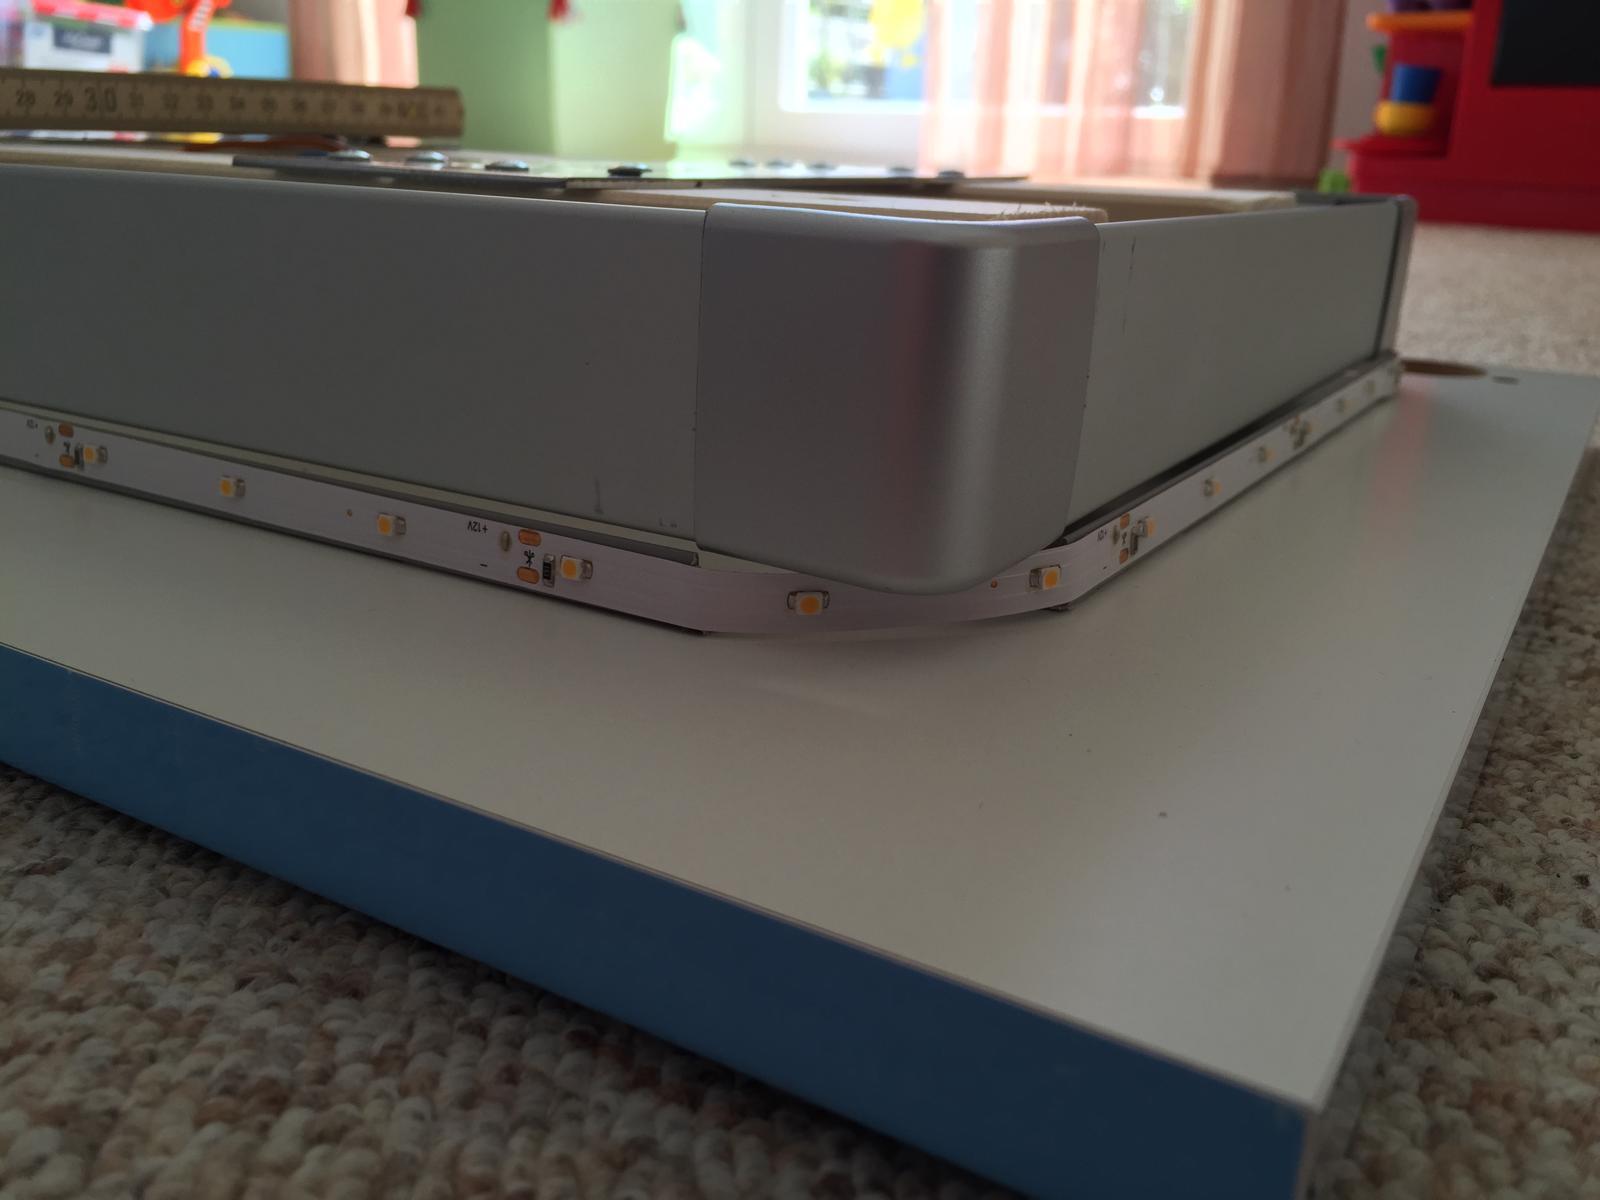 Deckenlampe selber bauen LED Strip – HAUSBAU38.de